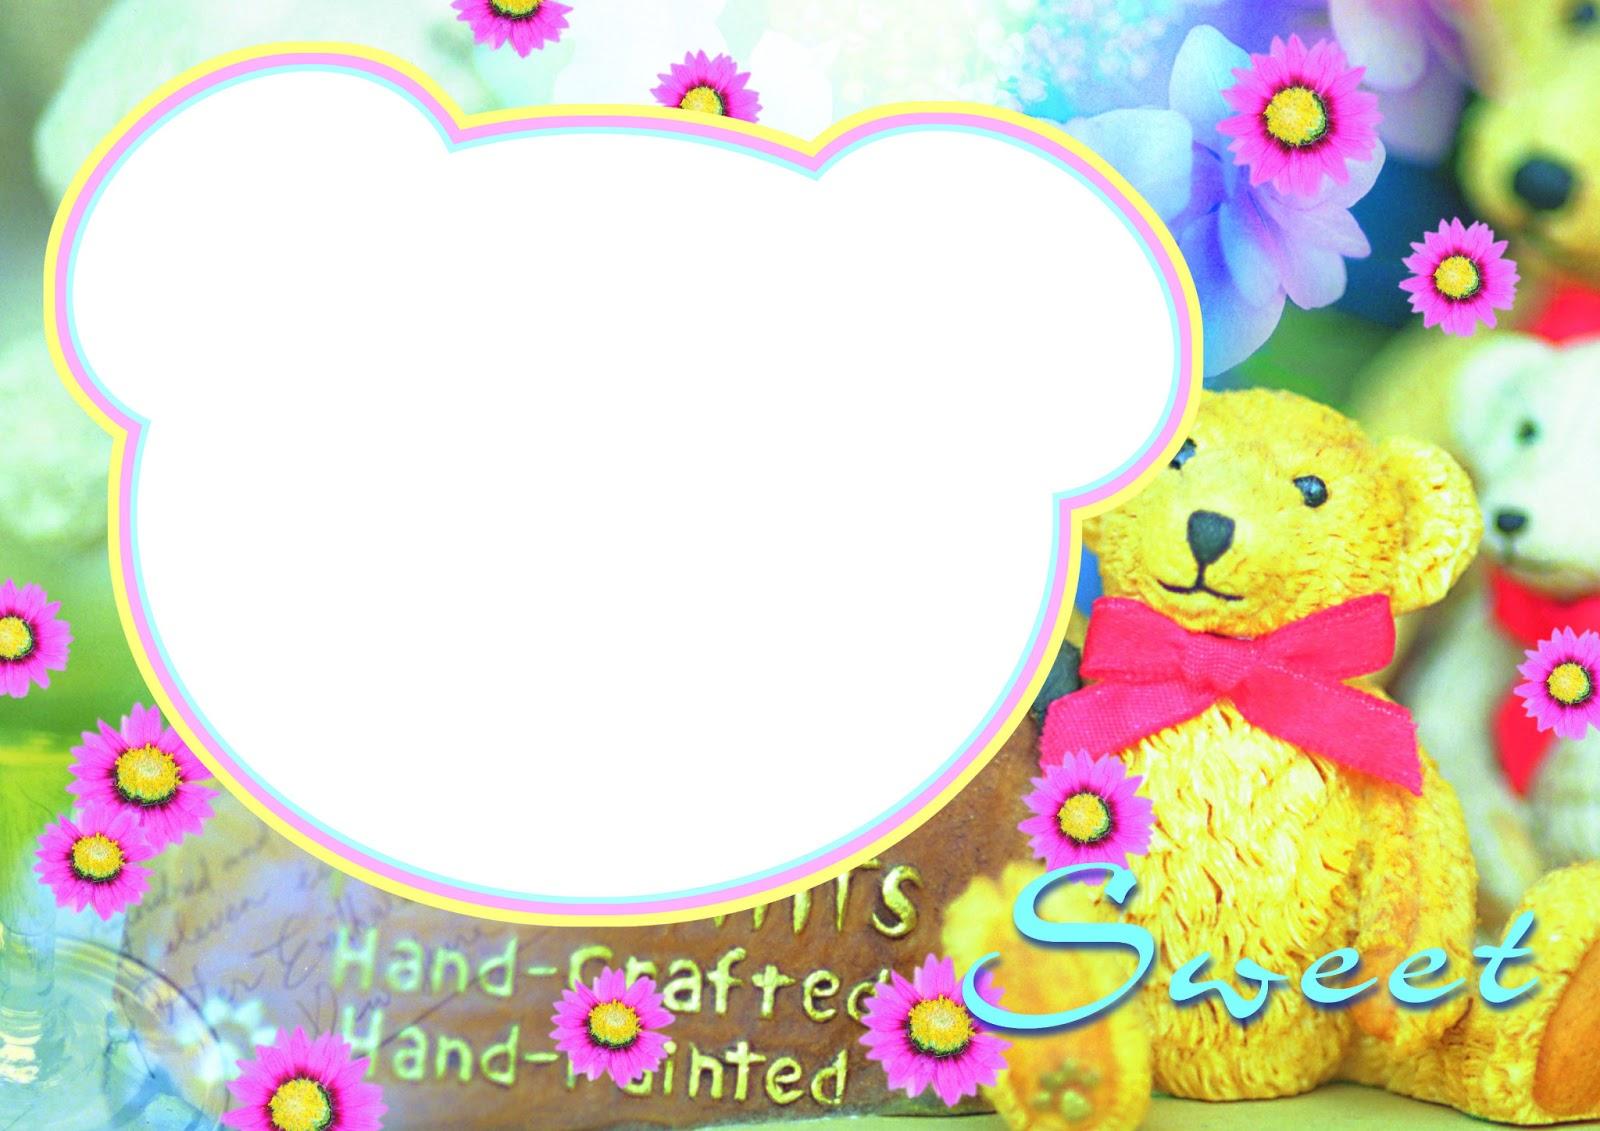 Gambar Kata Kata | Gambar DP BBM | Kata Mutiara Cinta